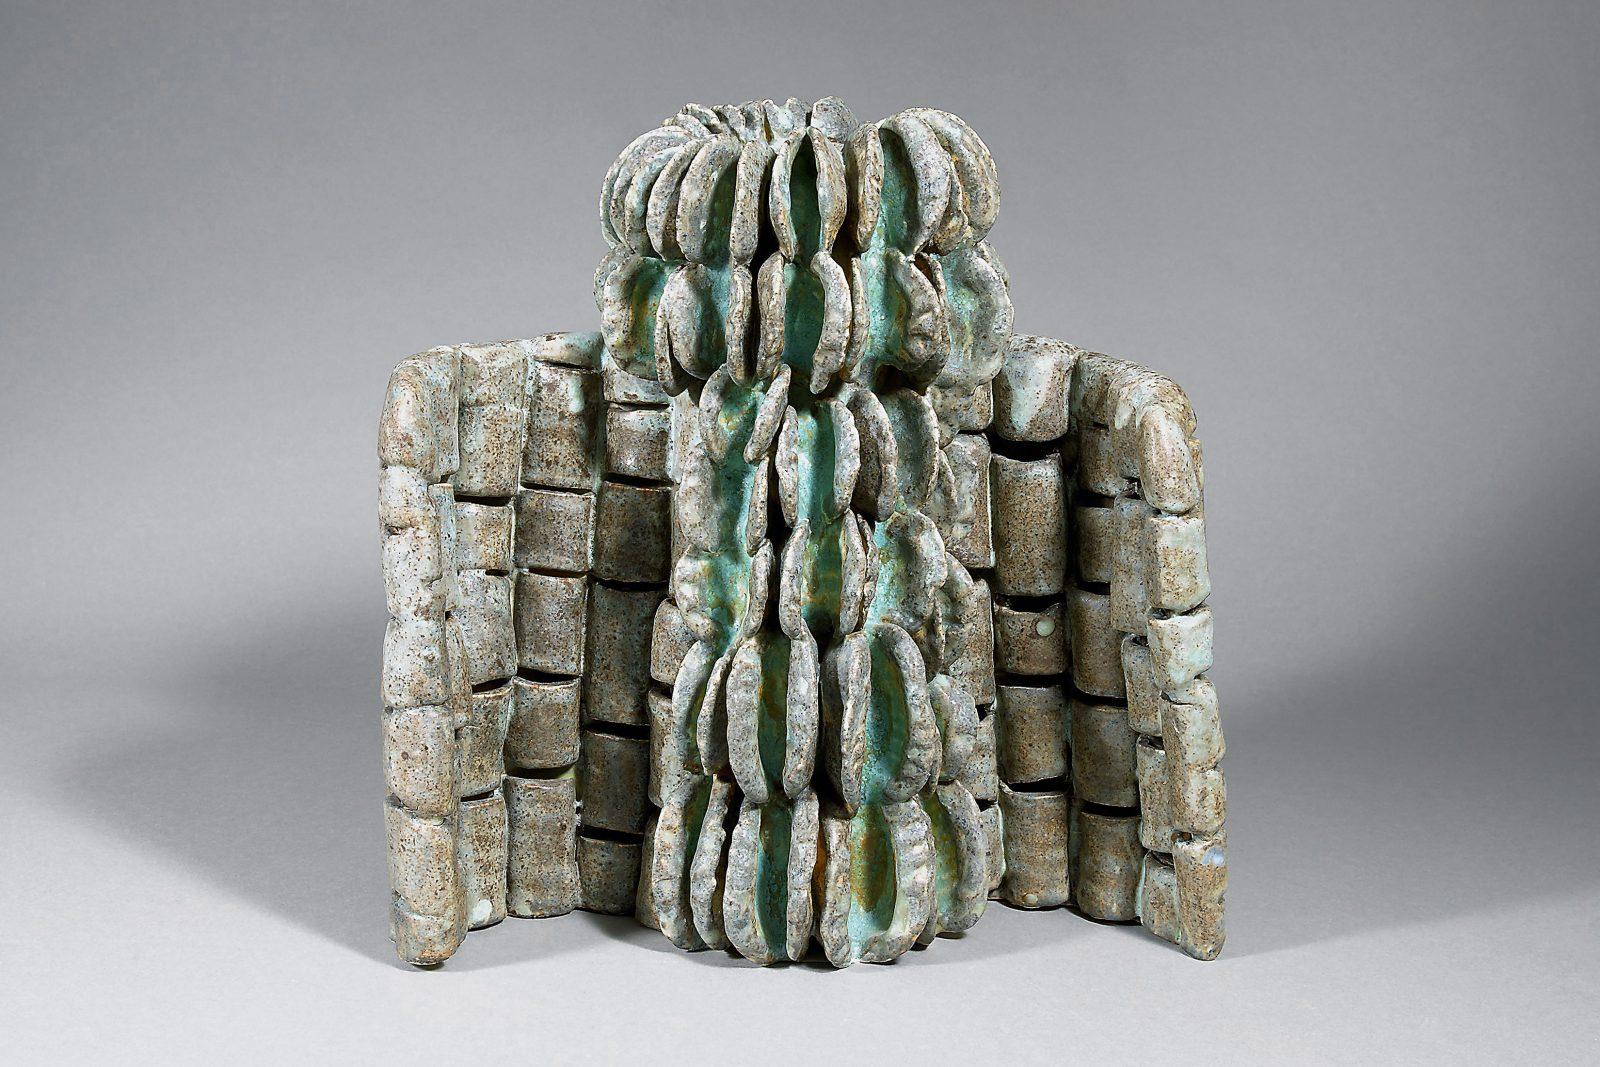 Beate Kuhn – Birnbaumstamm – 2013, 30x30x15cm – Galerie Metzger Gallery Kunst Keramik Plastik Art Ceramics Sculpture